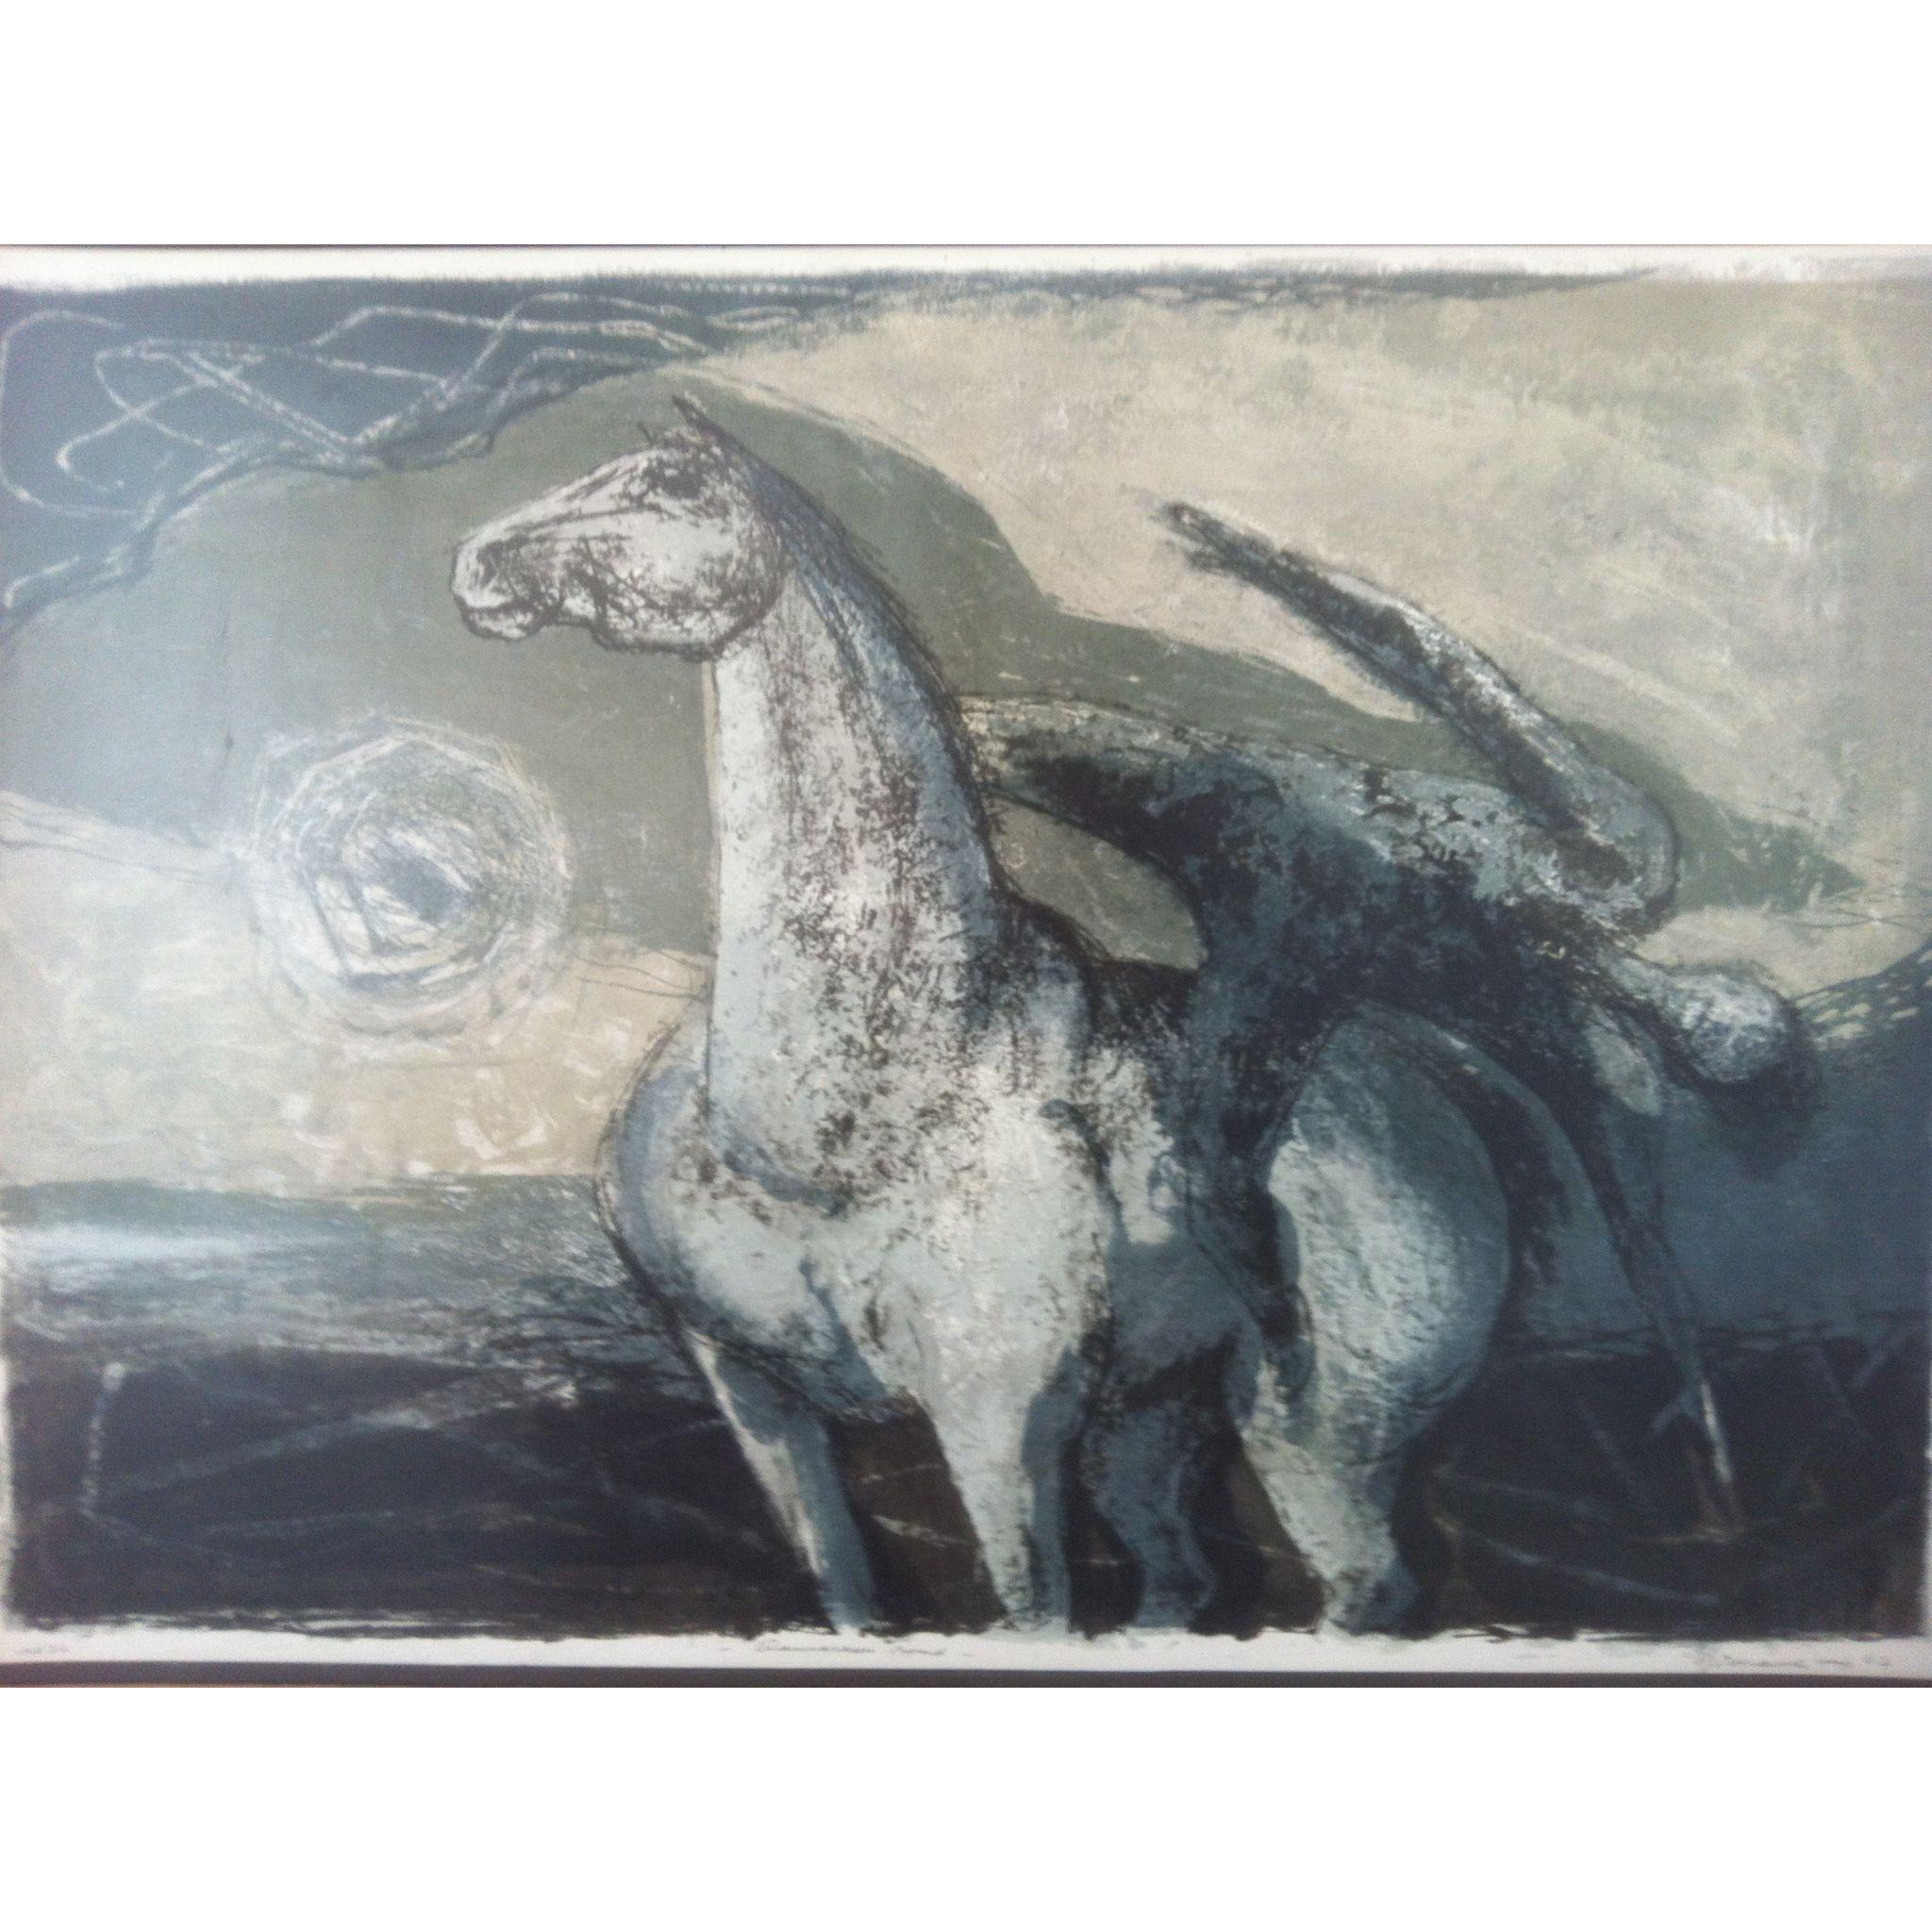 Benton Murdoch Spruance •Damascus• 1962 signed Original Lithograph